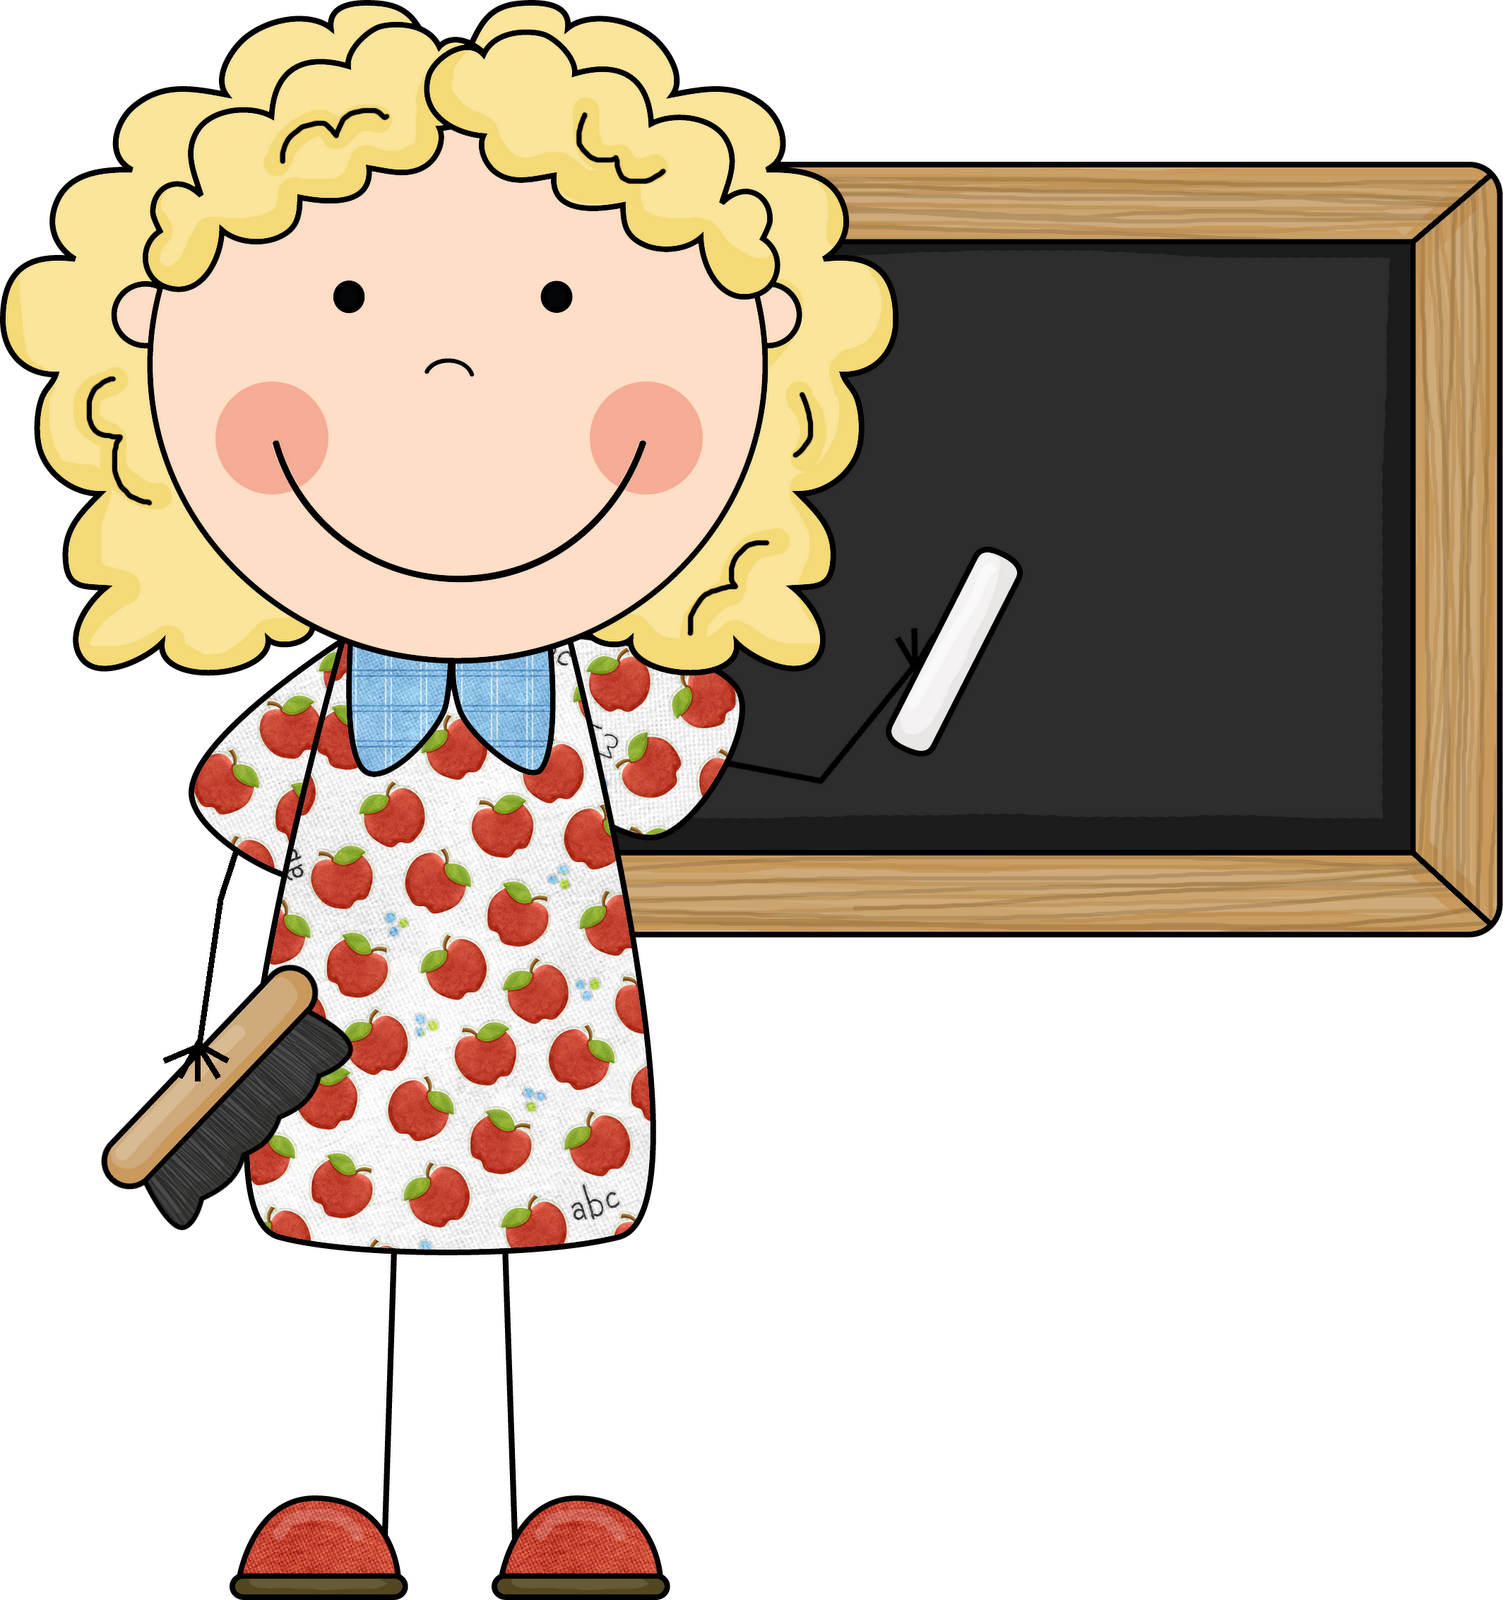 Student at Teachers Desk